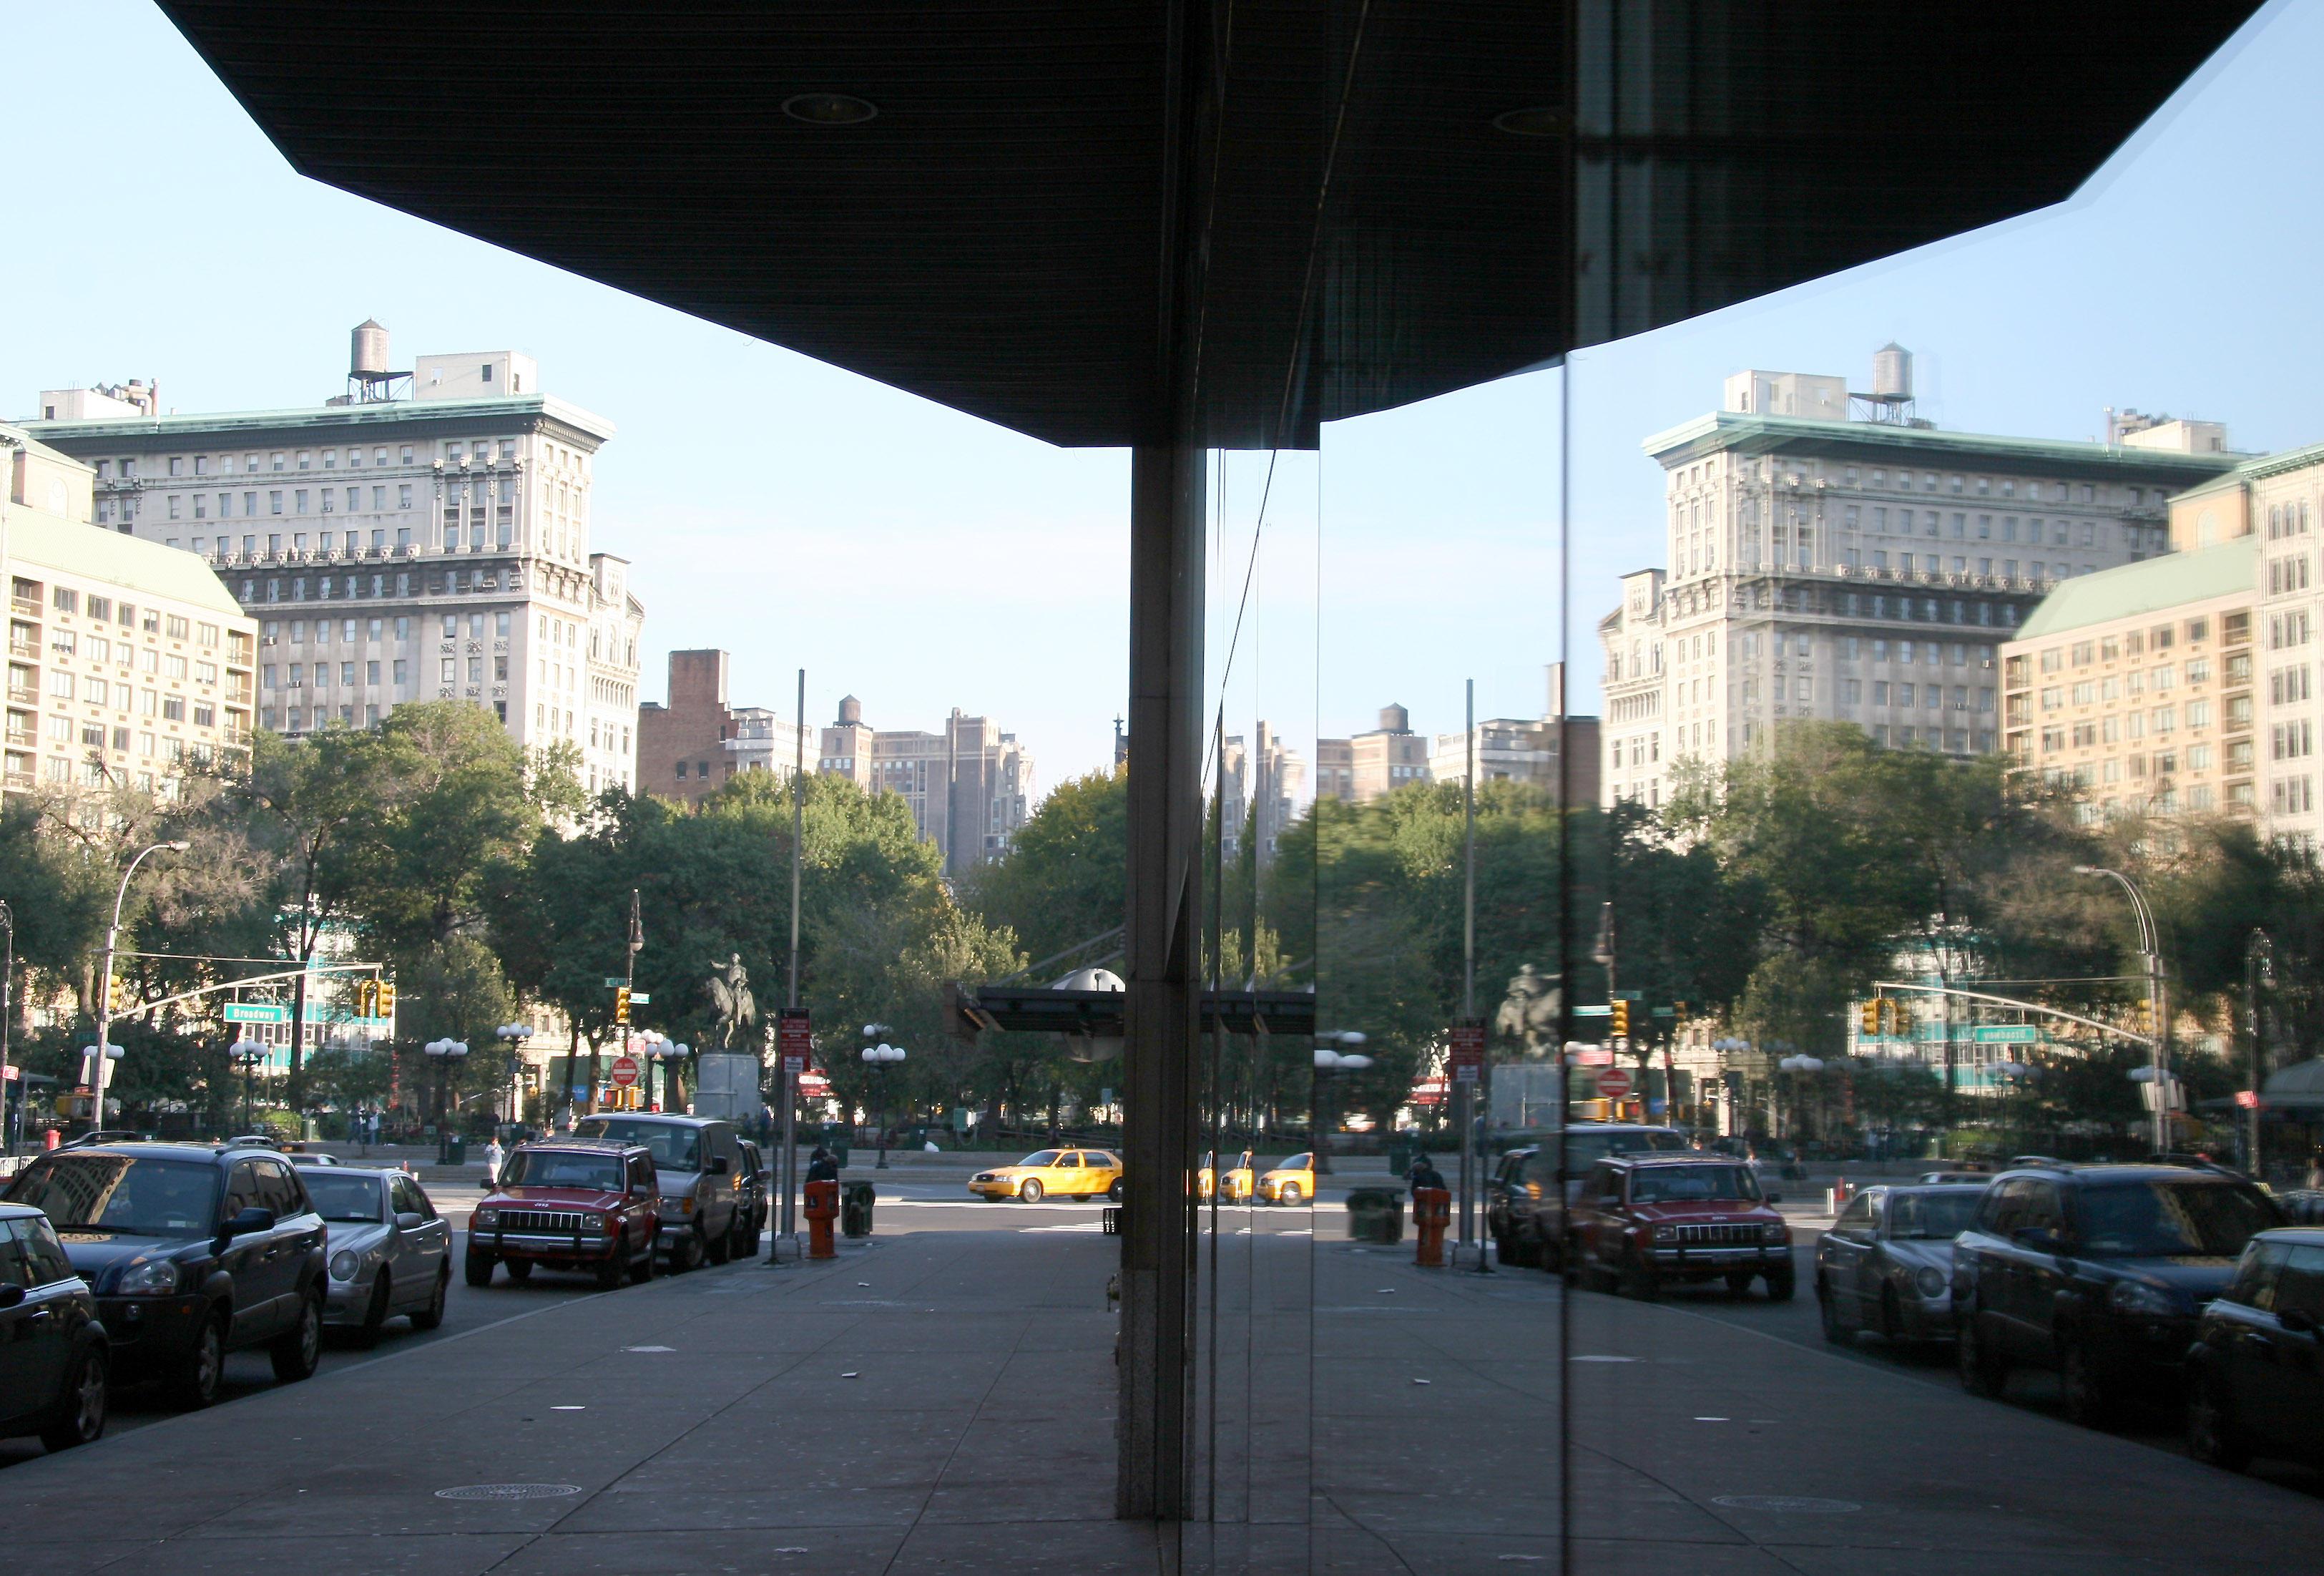 Union Square - United Artists Cinema Marque Reflection